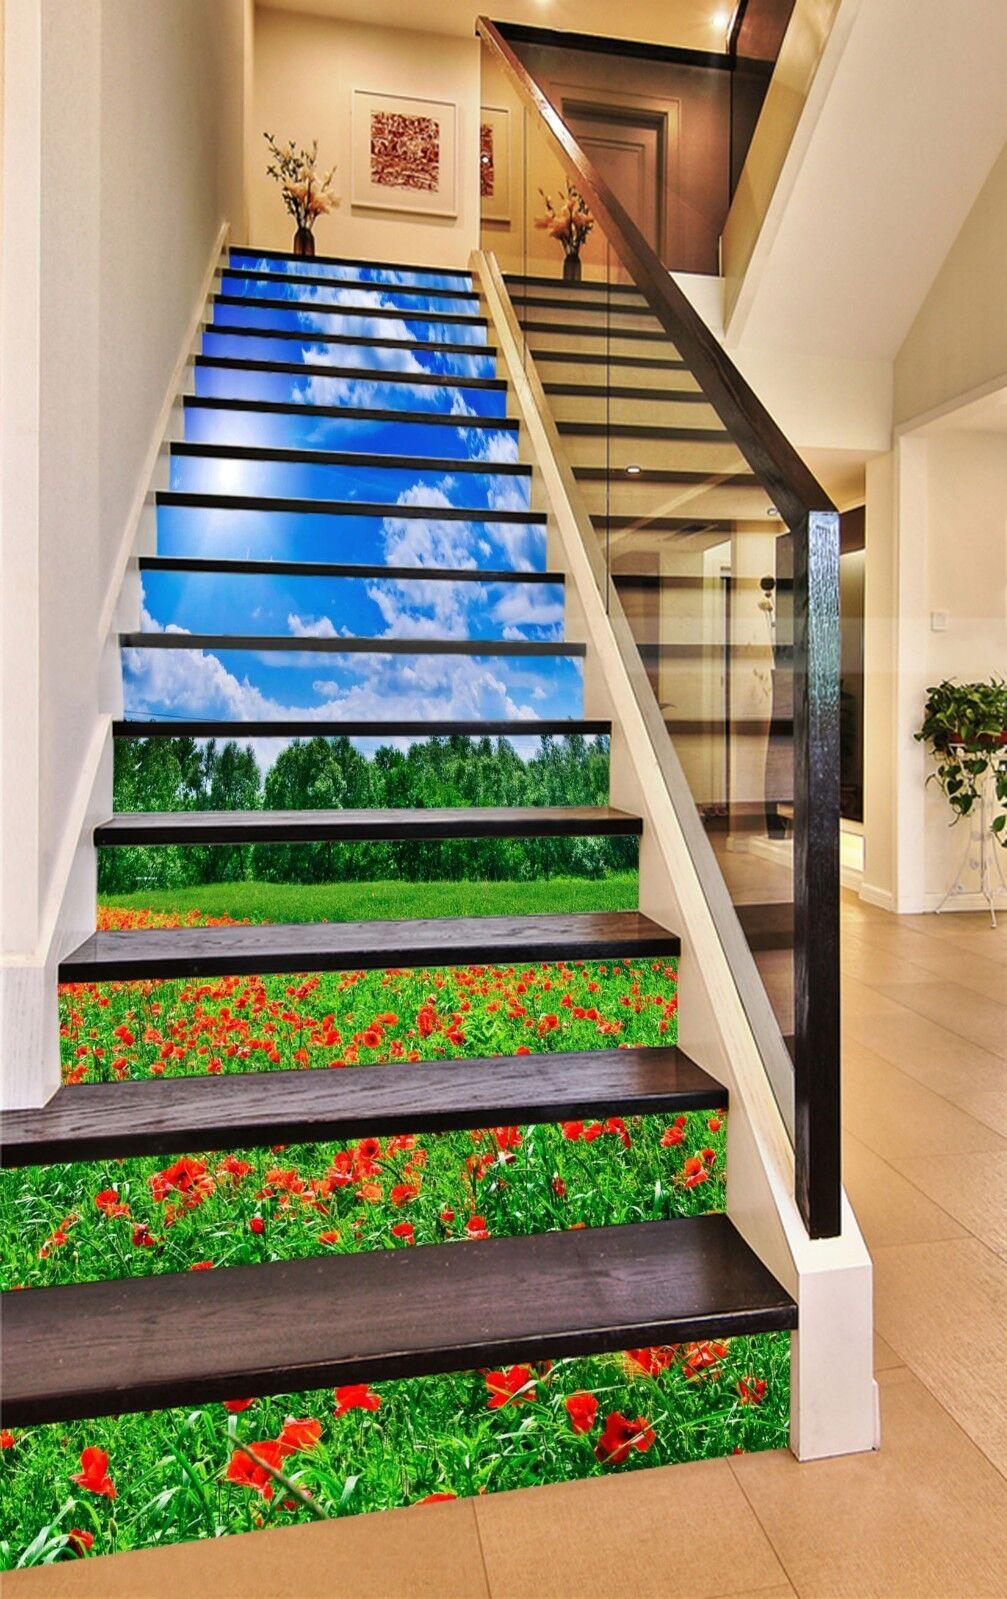 3D Sky flower field Stair Risers Decoration Photo Mural Vinyl Decal WandPapier AU